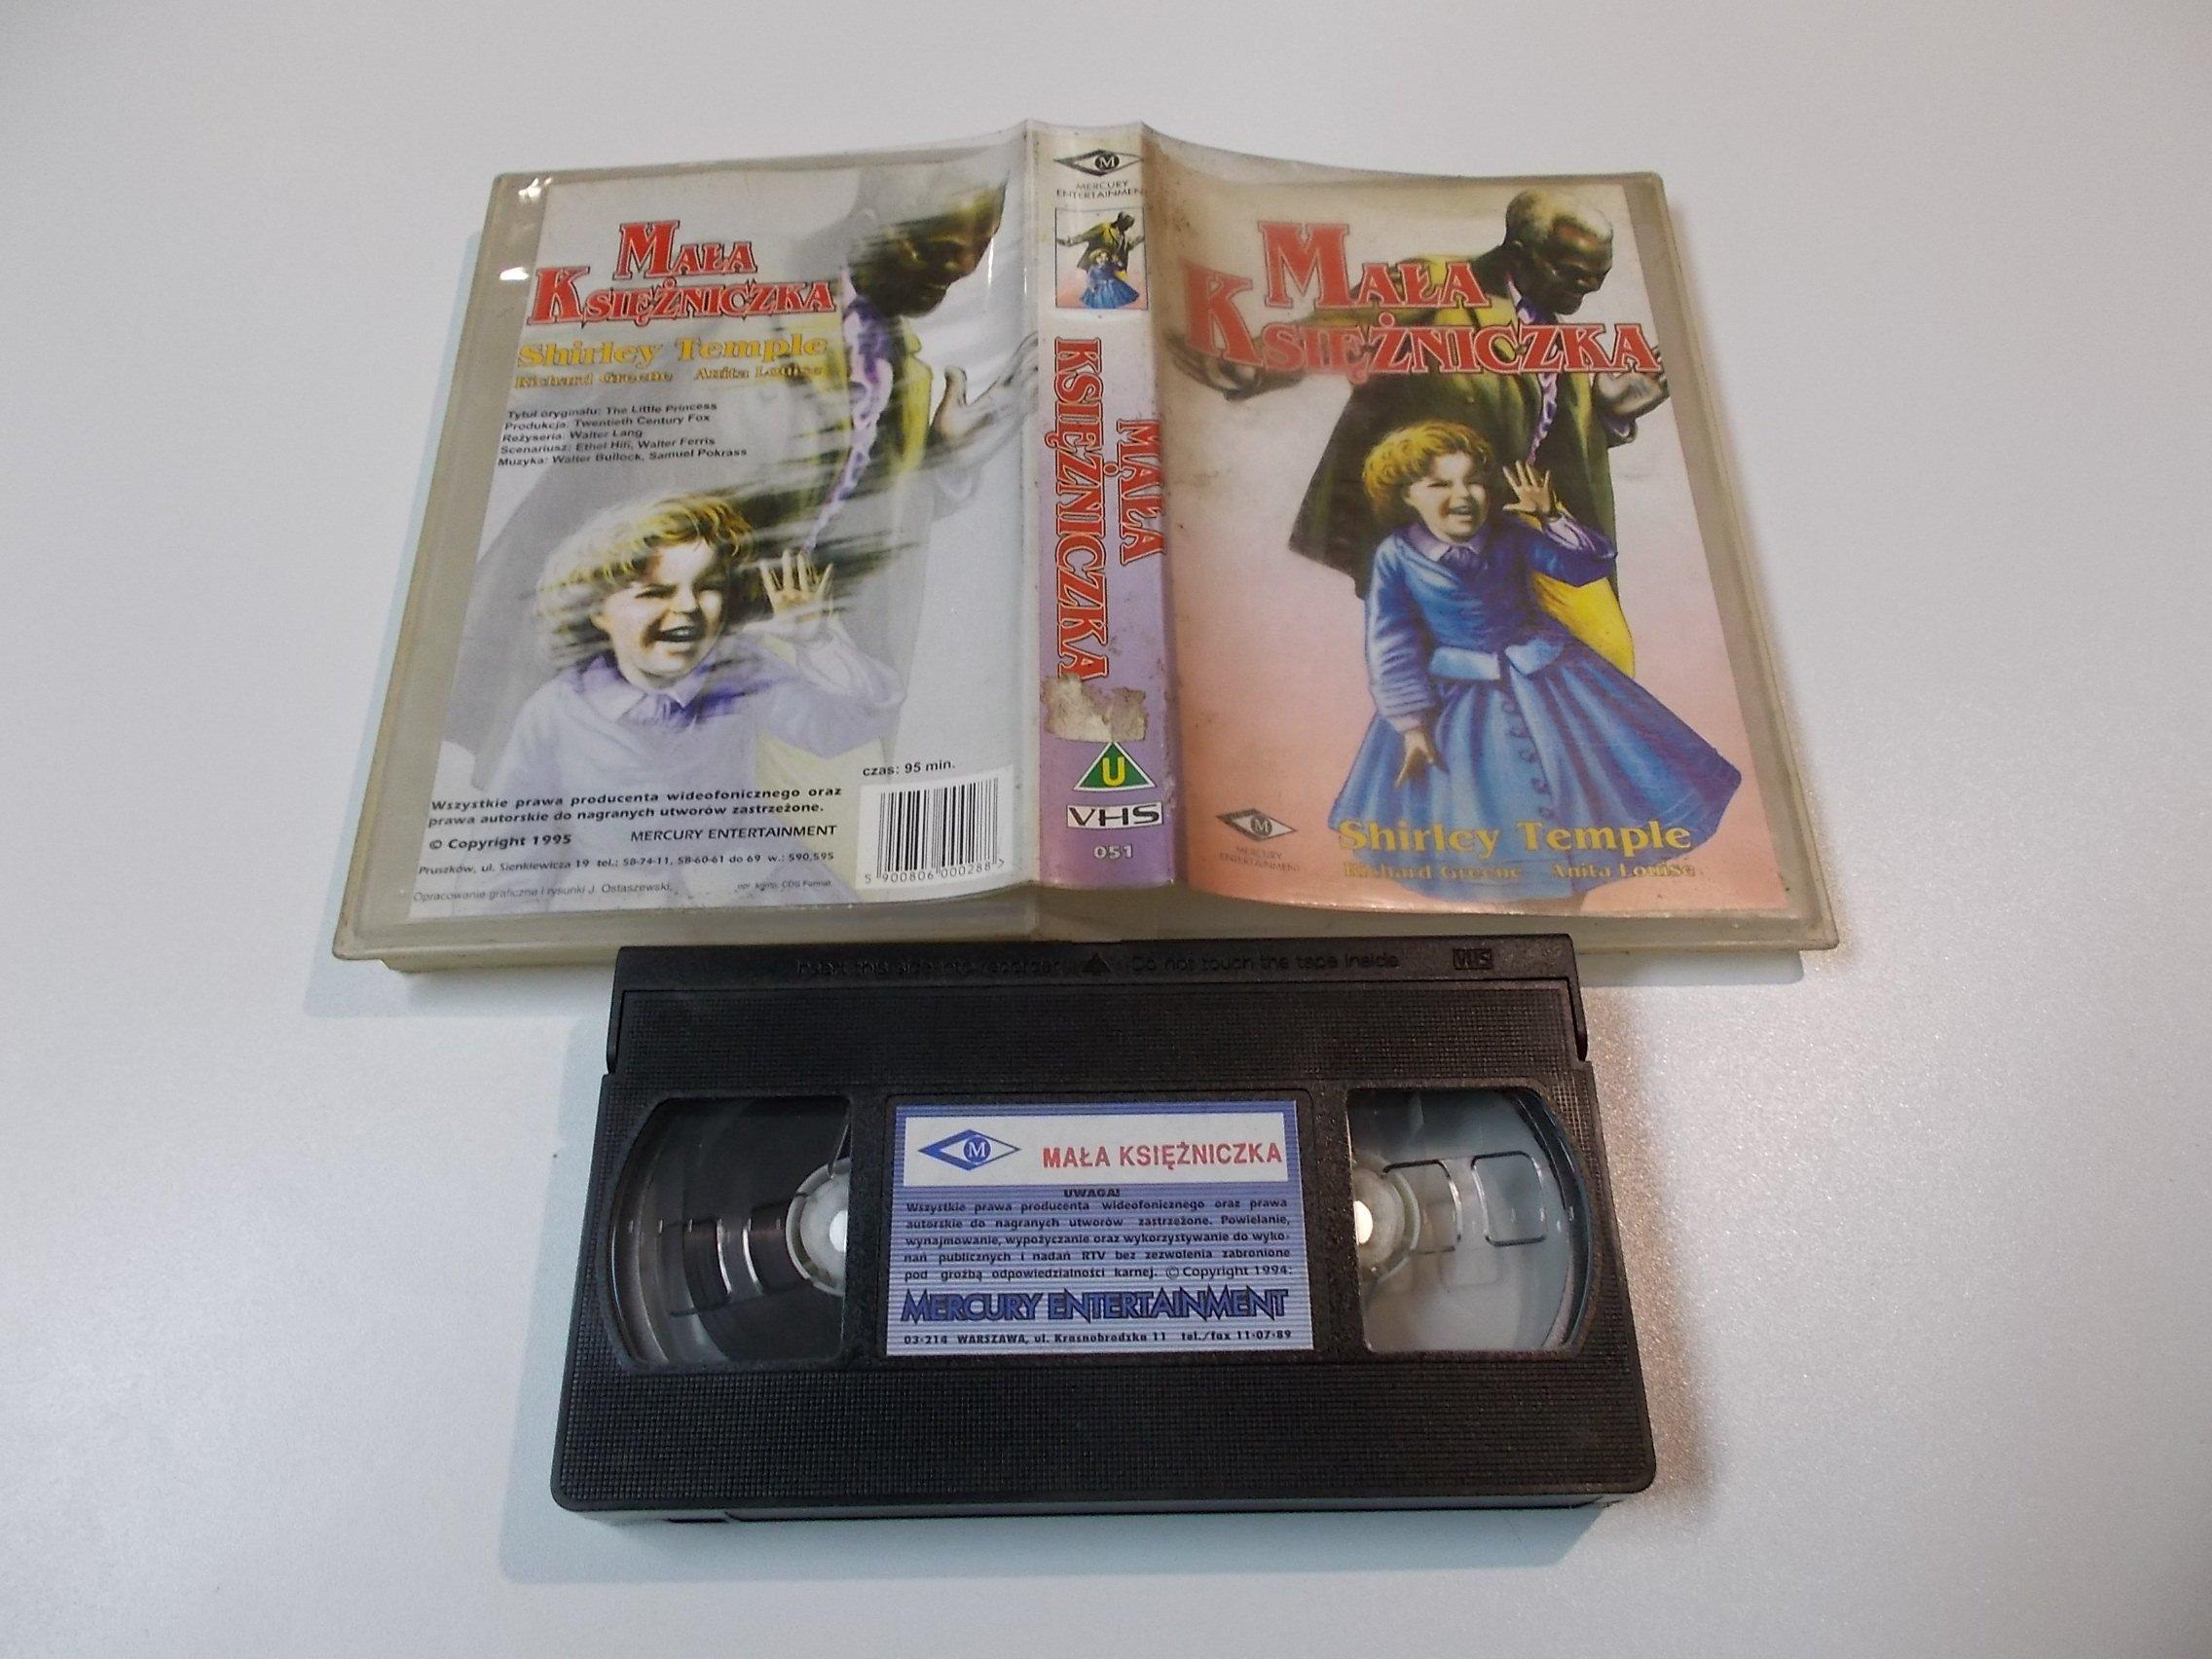 MAŁA KSIĘŻNICZKA - kaseta Video VHS - 1445 Sklep